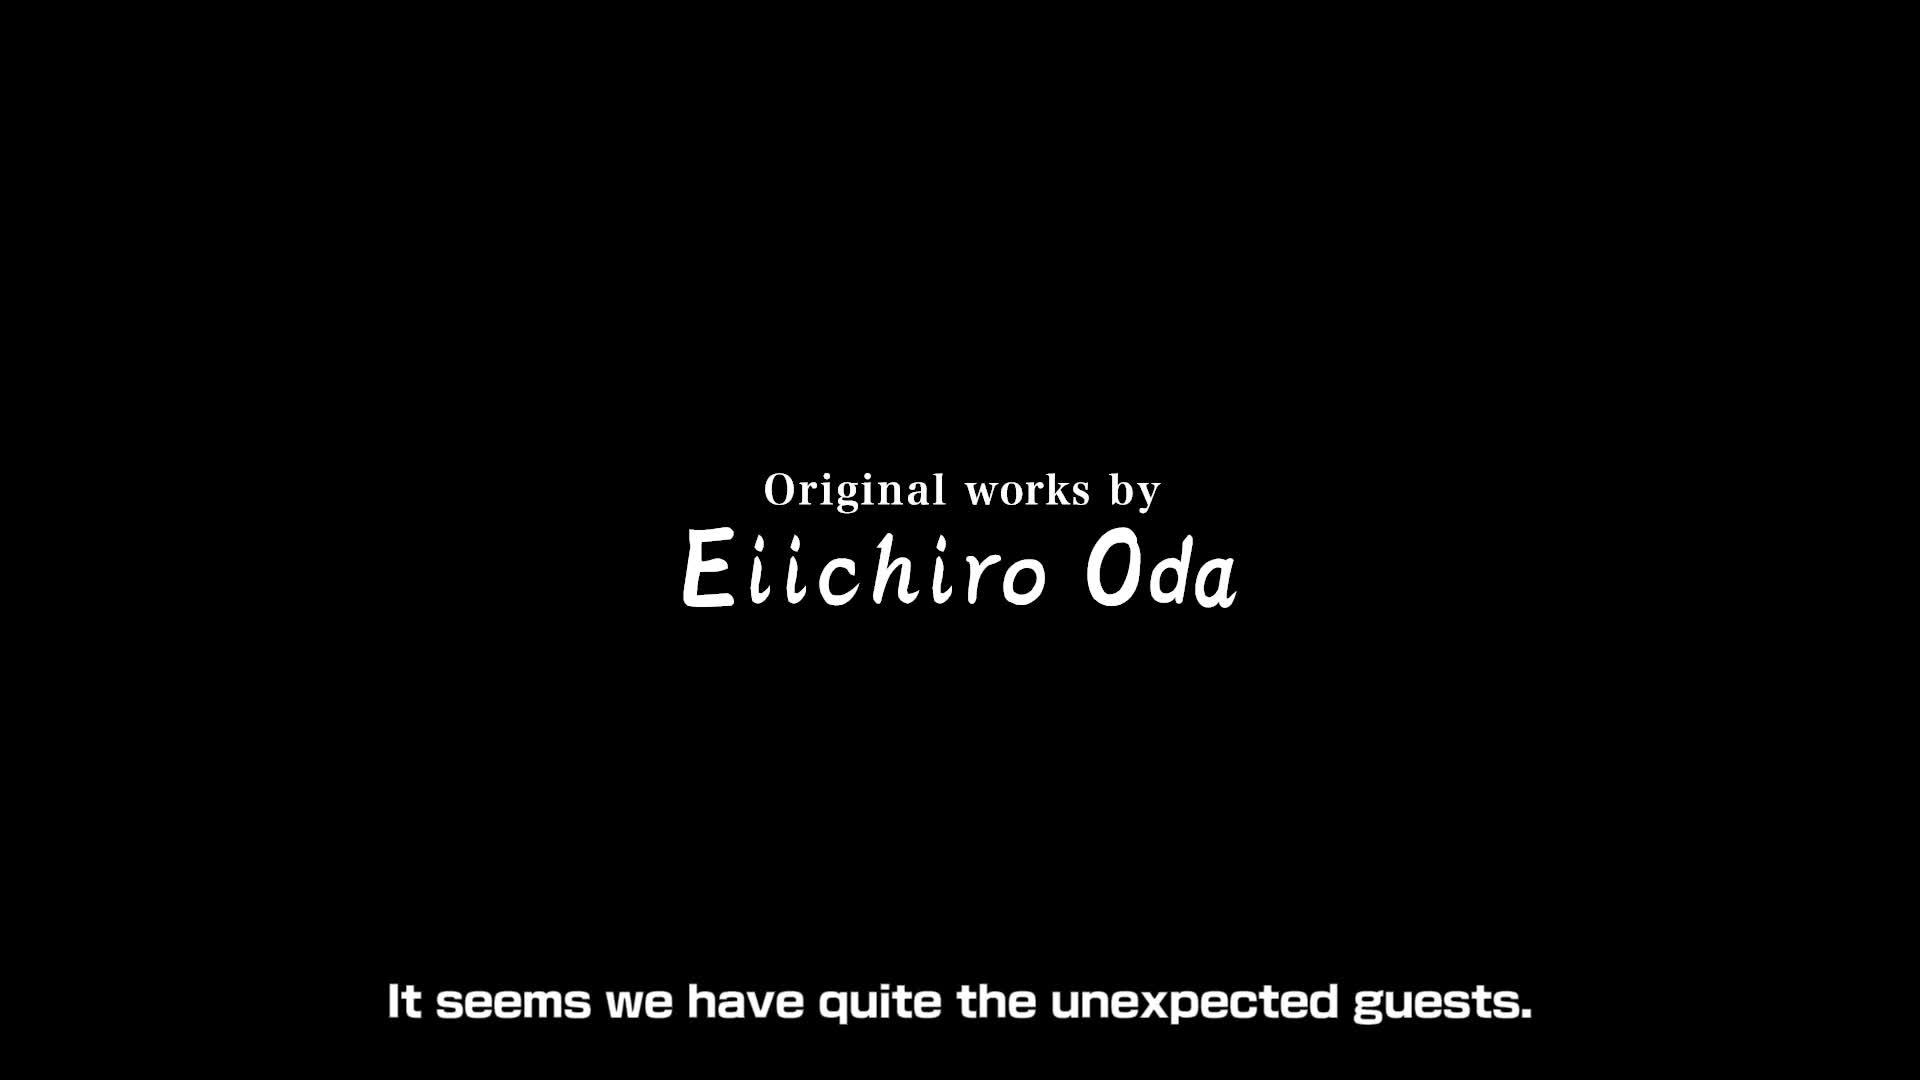 One Piece Pirate Warriors 4 - Wano Country TGS Trailer [HD] screen capture